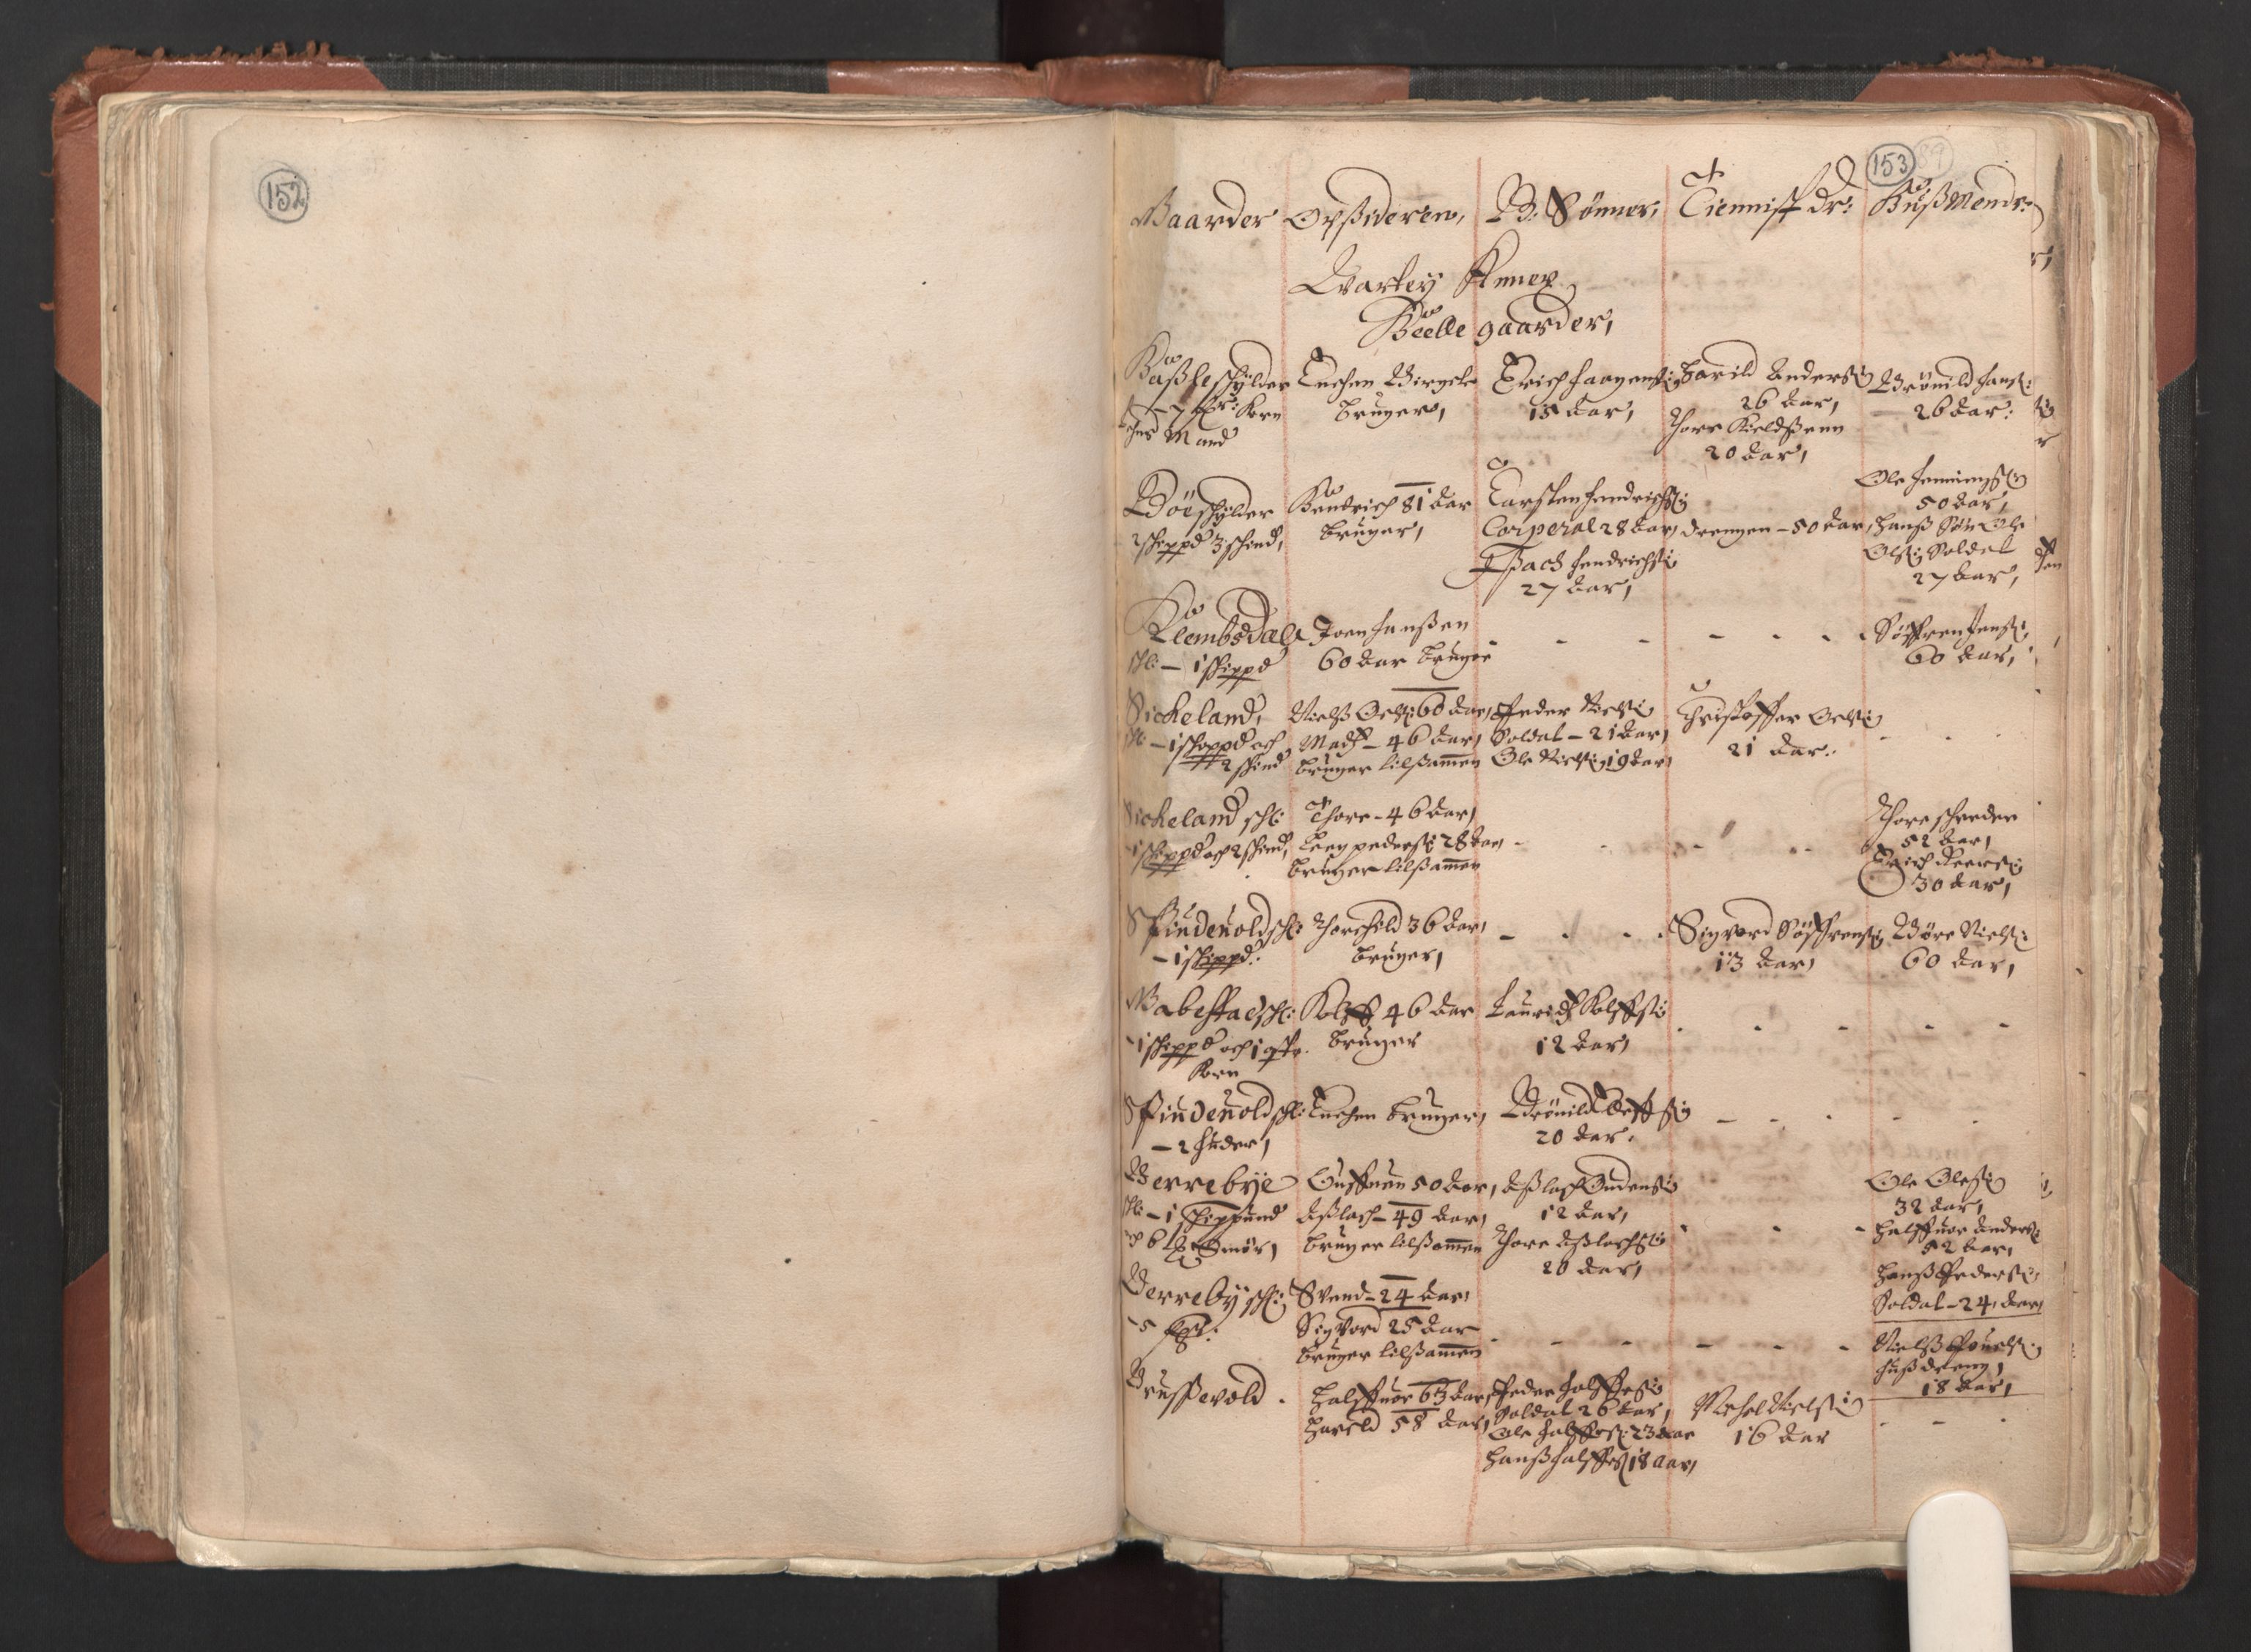 RA, Fogdenes og sorenskrivernes manntall 1664-1666, nr. 1: Fogderier (len og skipreider) i nåværende Østfold fylke, 1664, s. 152-153